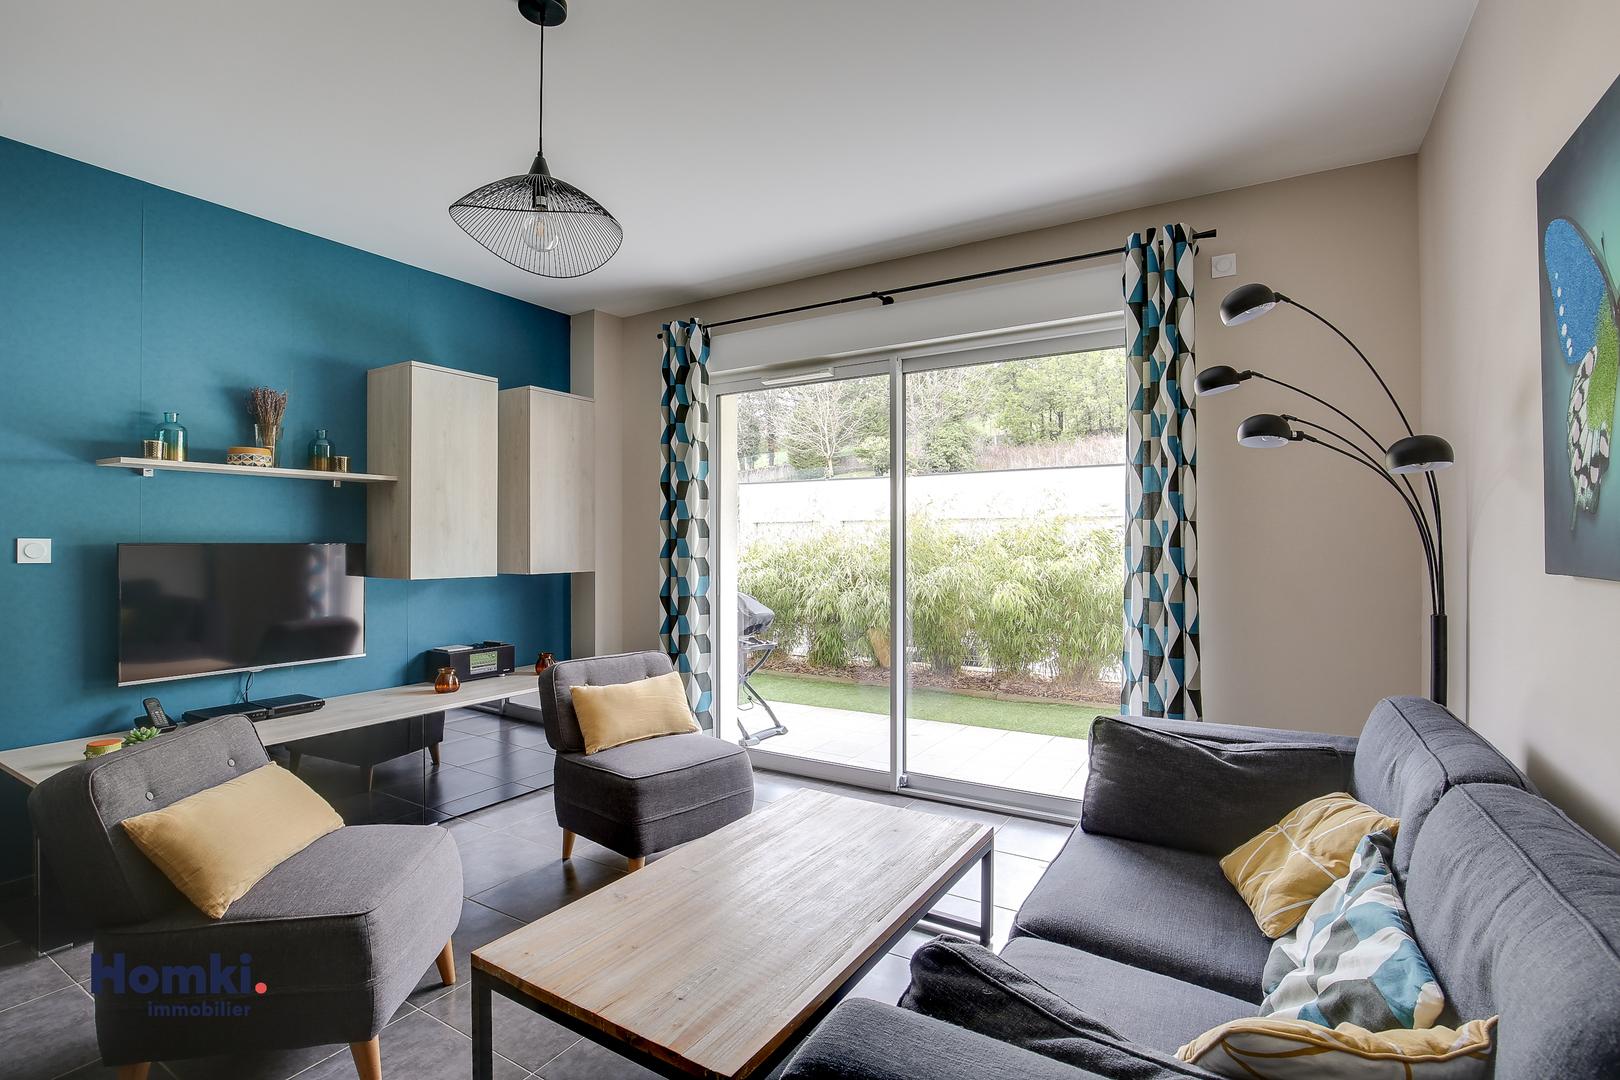 Appartement I 53m² I T2 I 69580 | photo 2